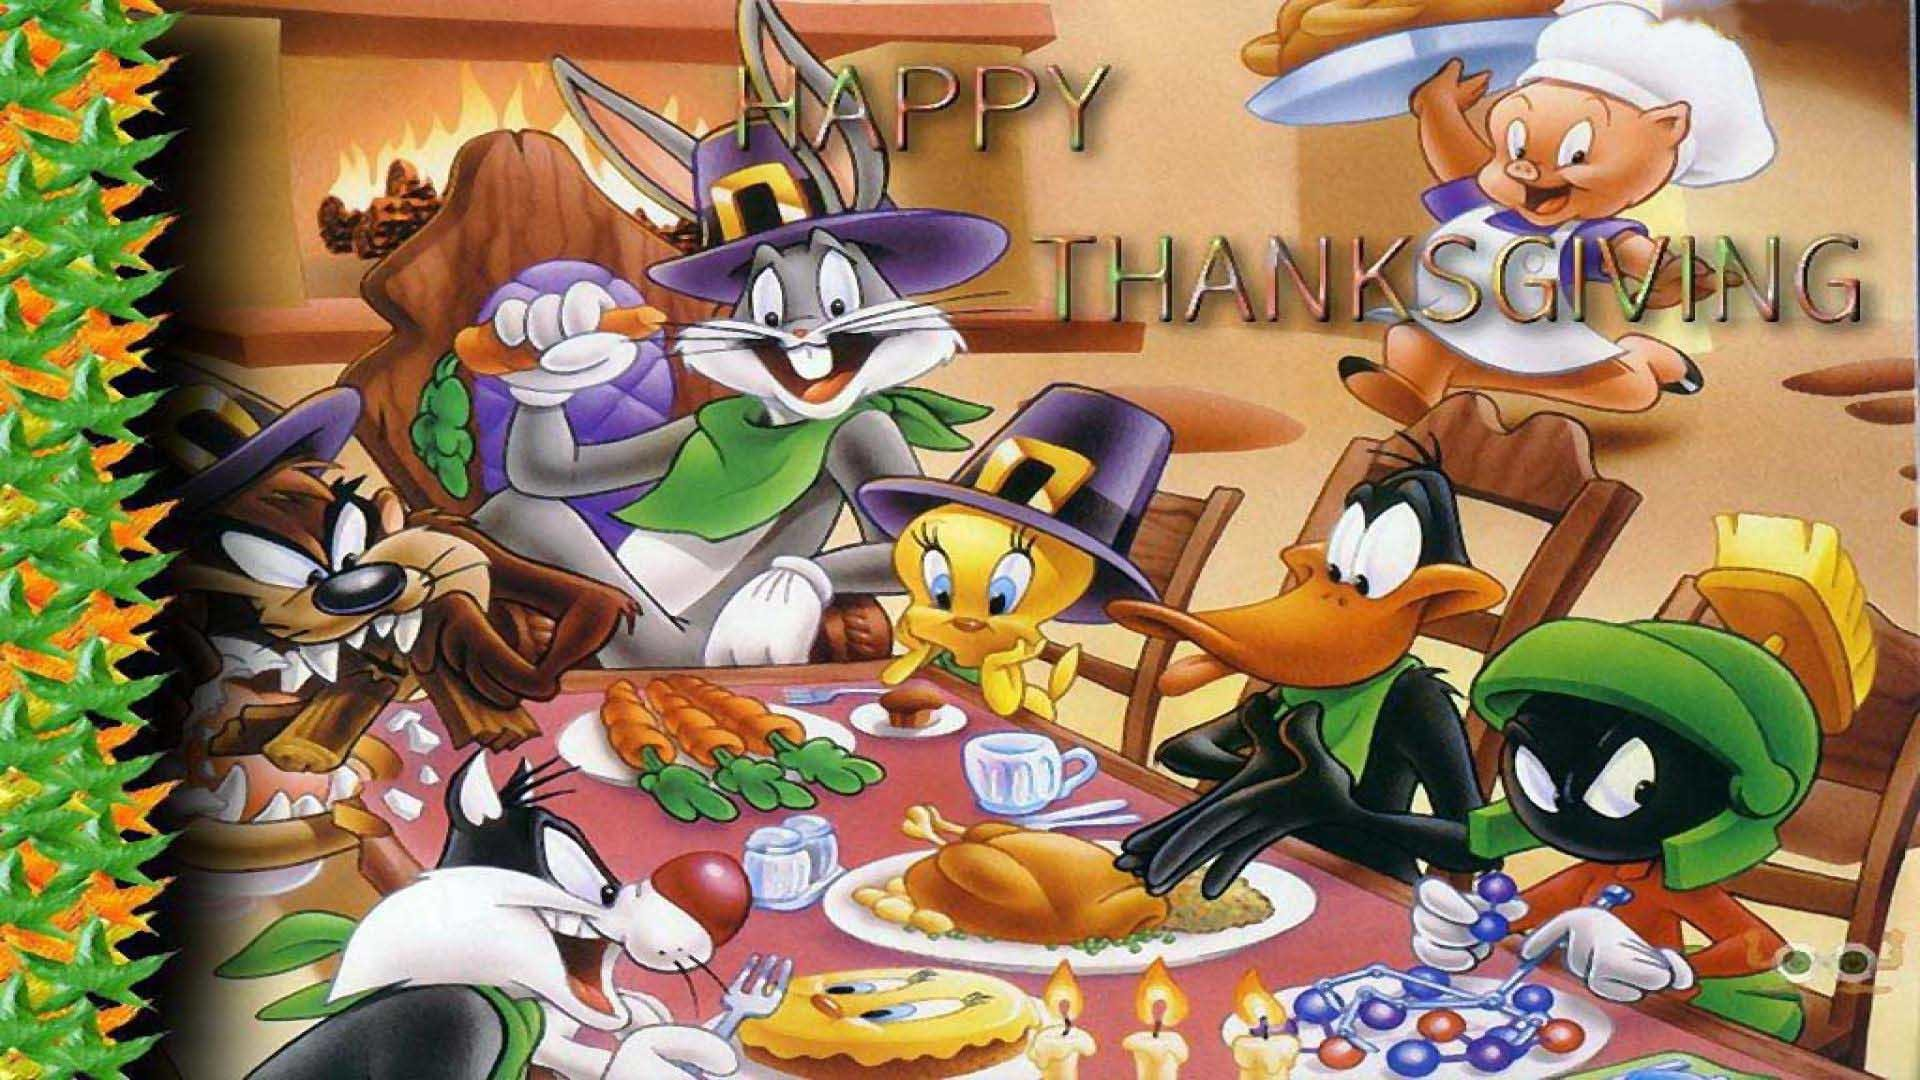 Disney Thanksgiving Wallpaper.